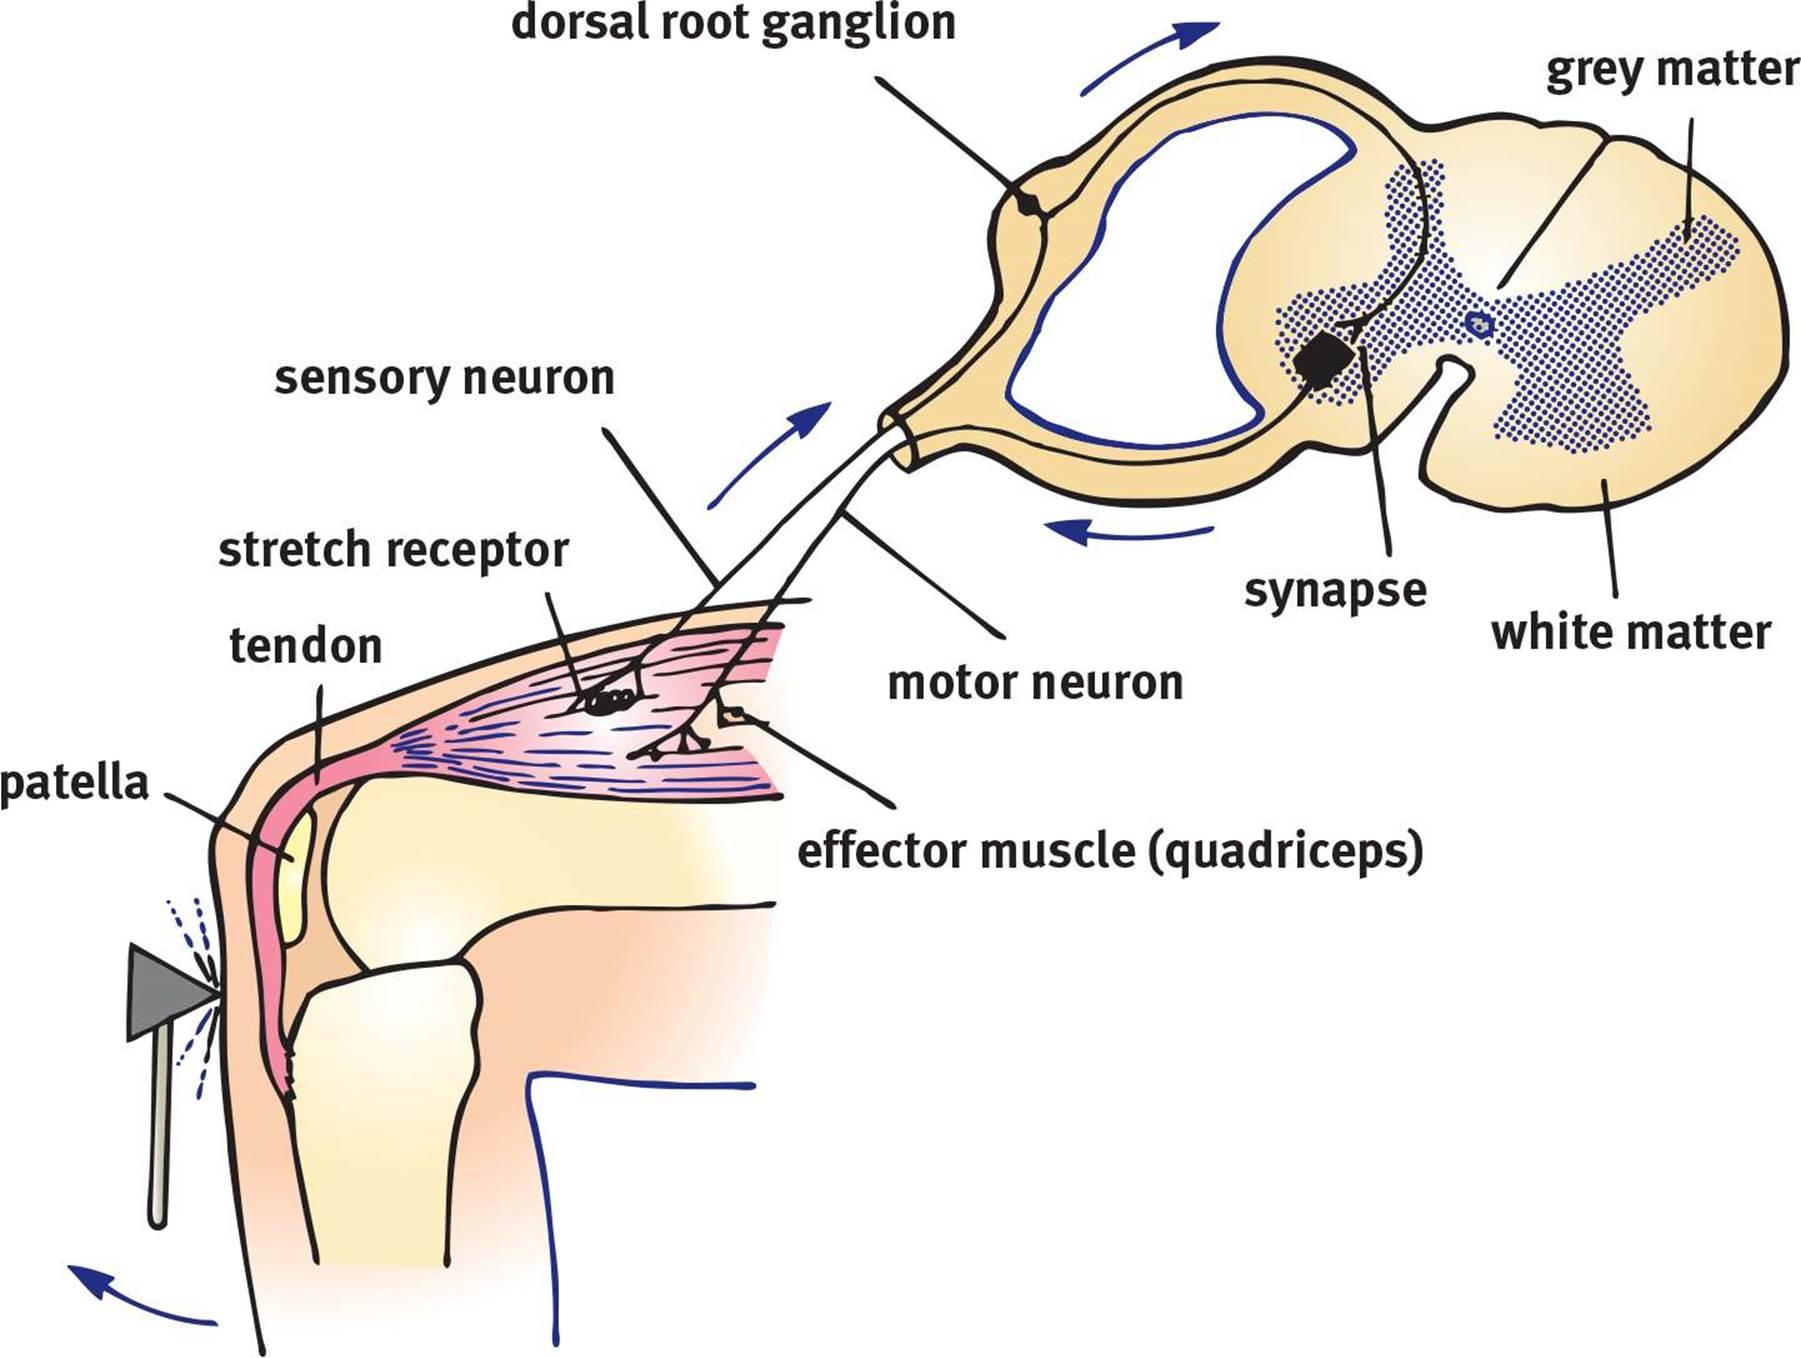 Organization of the Human Nervous System - The Nervous System - MCAT